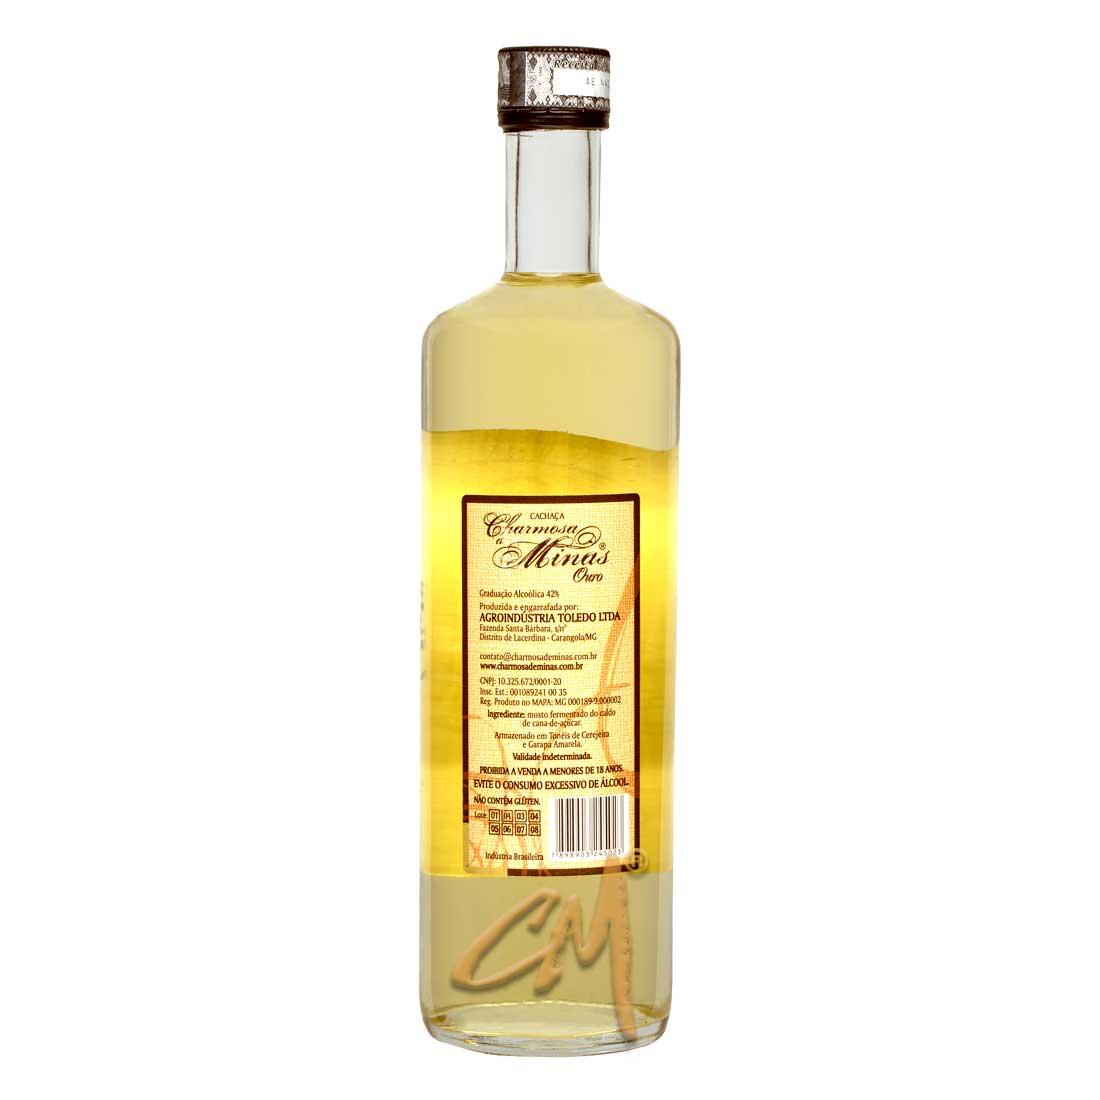 Cachaça Charmosa de Minas Ouro 700 ml (Carangola - MG)